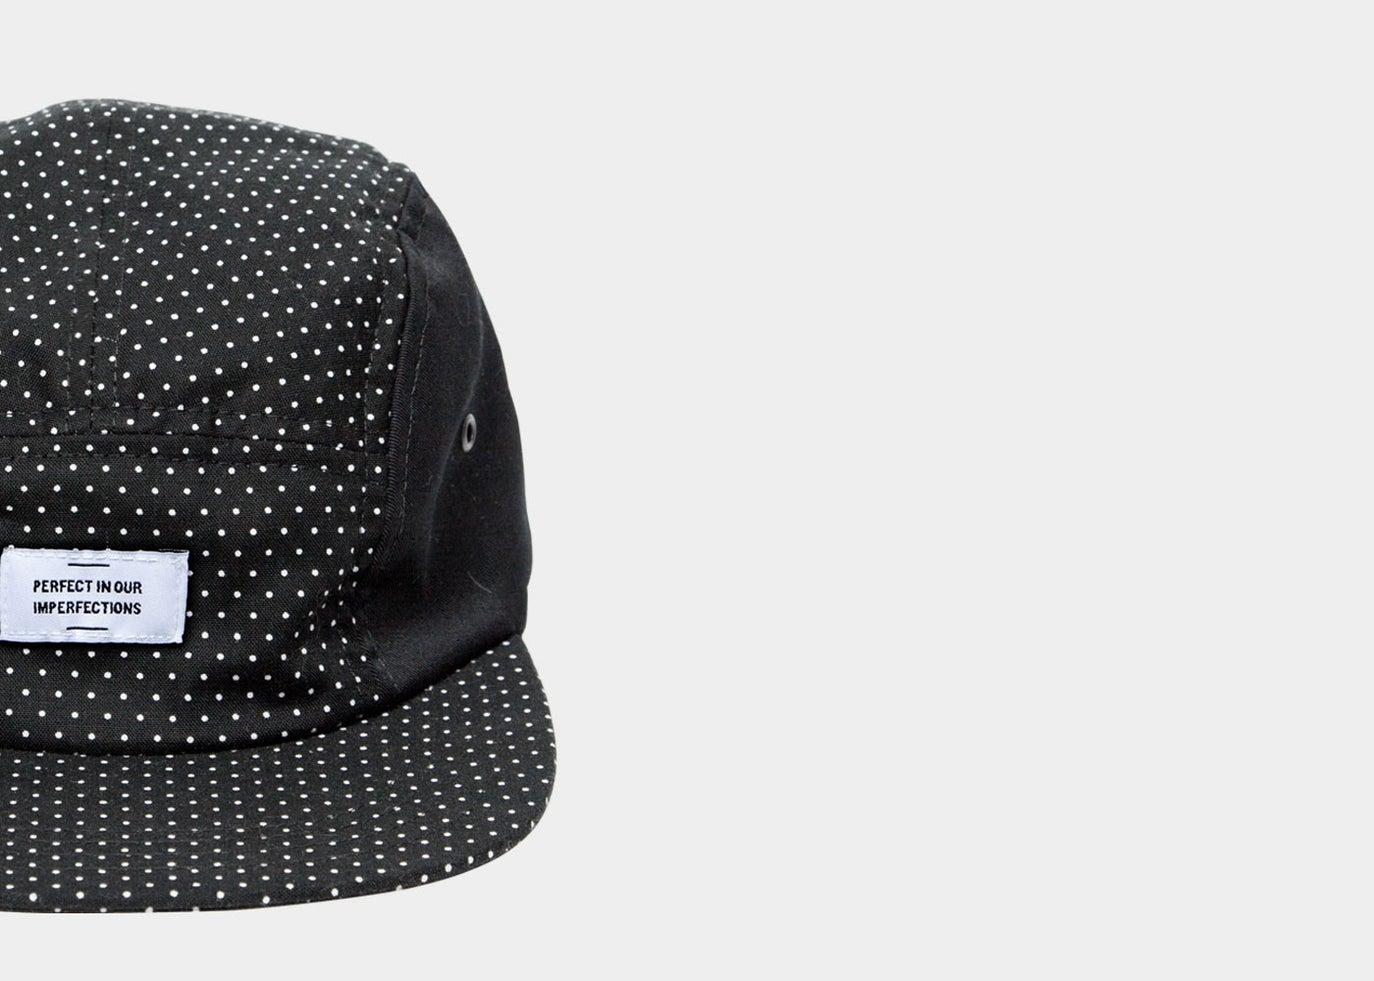 Image of The Polka Dot Cap